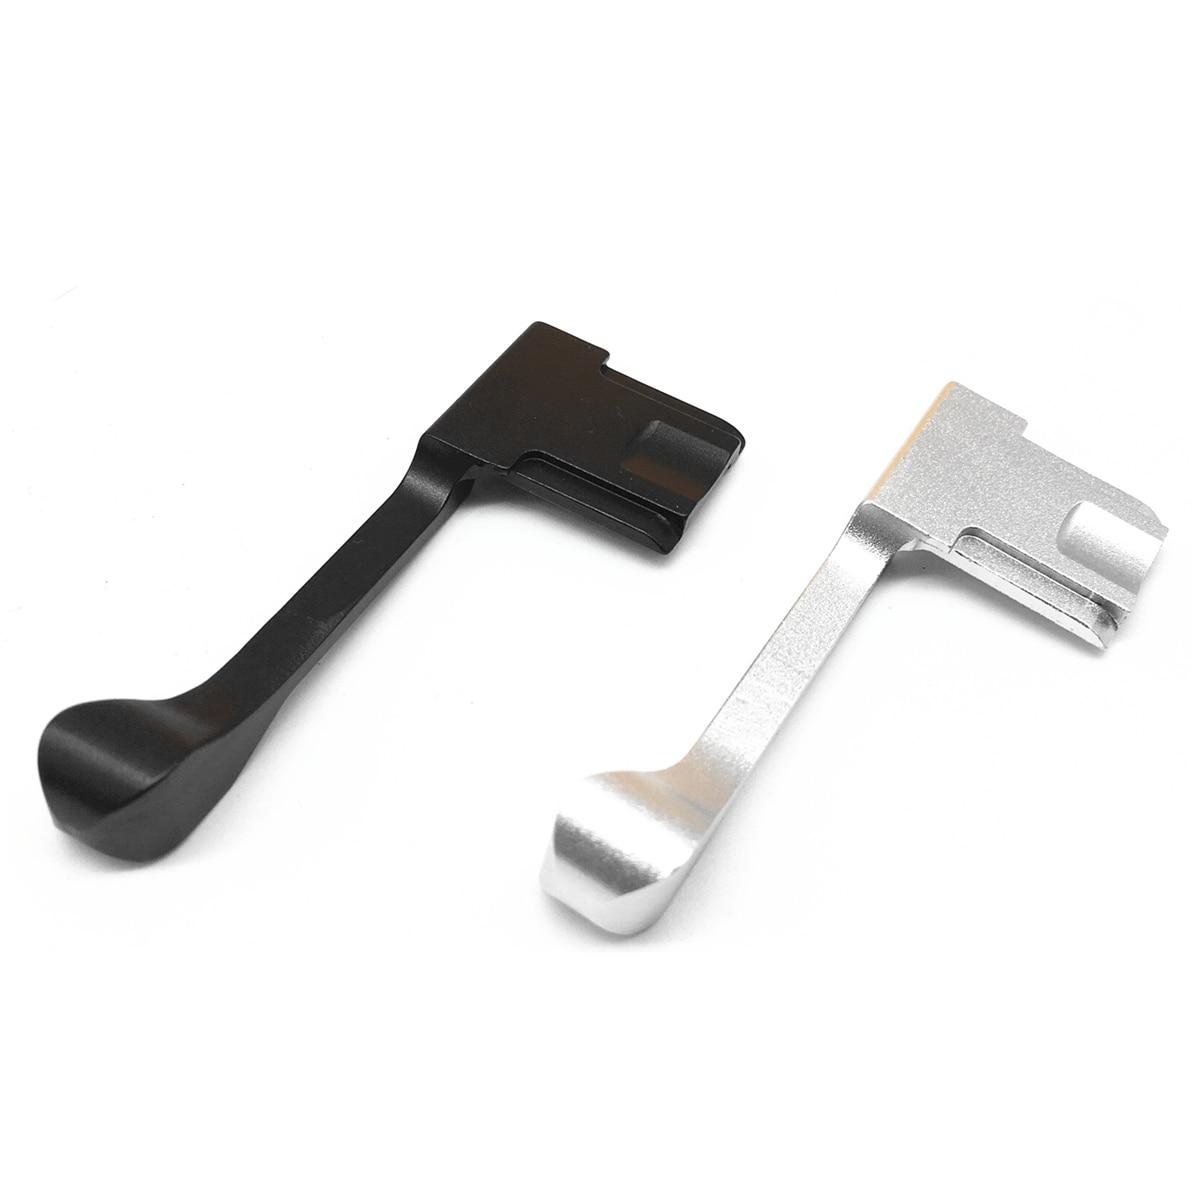 65mm Metal Hot Shoe Thumb Up Grip For Fujifilm Fuji X100F X100T X70 X30 X-E3 X-A1 X-A2 X-A3 X-A5 X-M1 XA3 XE3